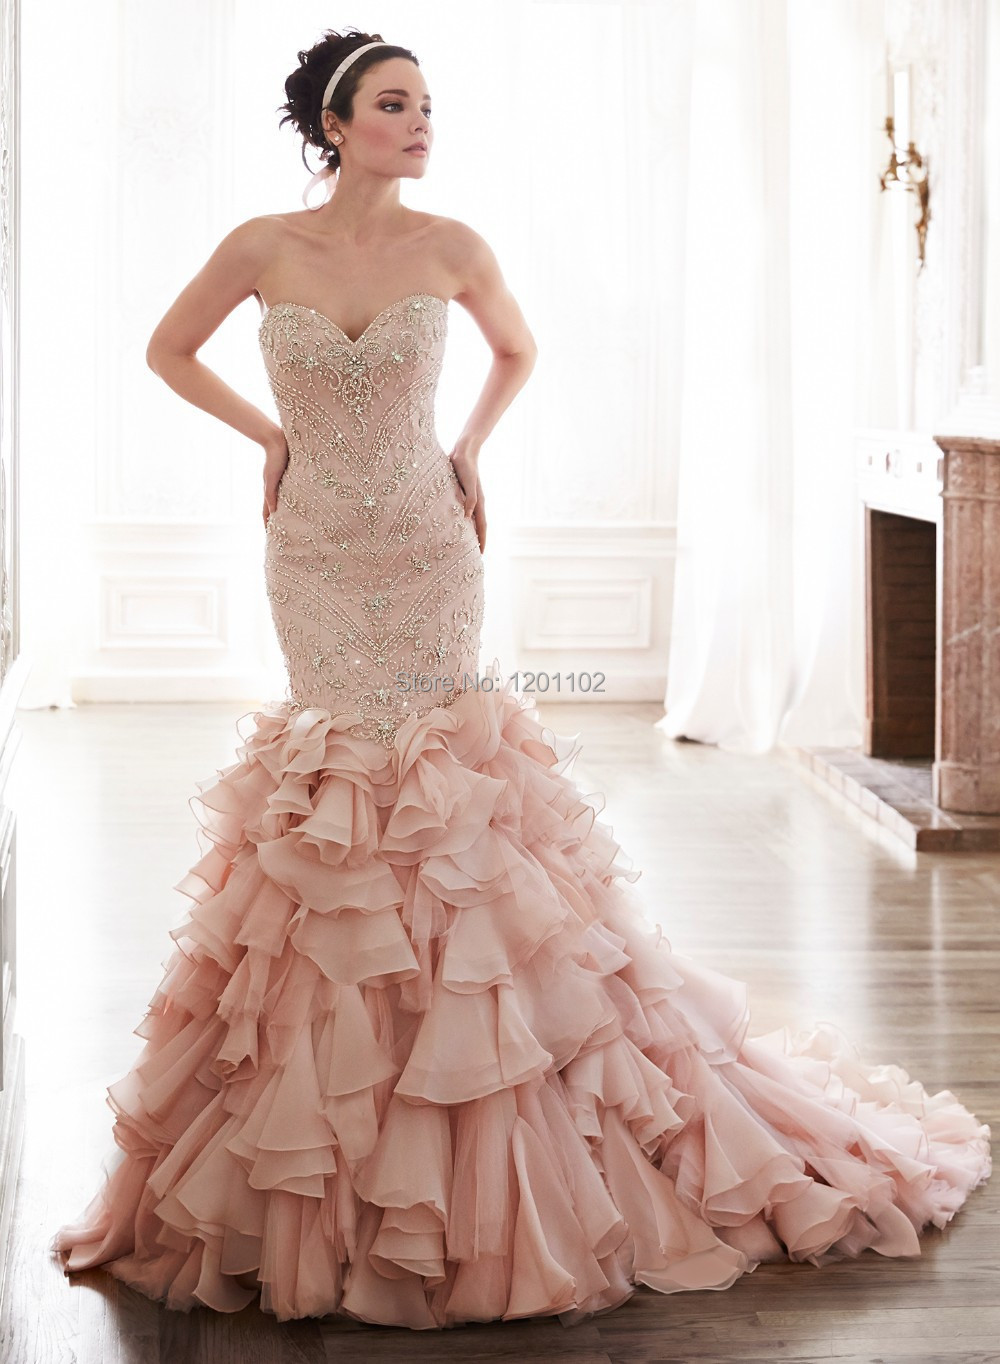 Vintage Wedding Dresses Pink : Luxury beaded blush pink mermaid wedding dress vintage bridal gowns